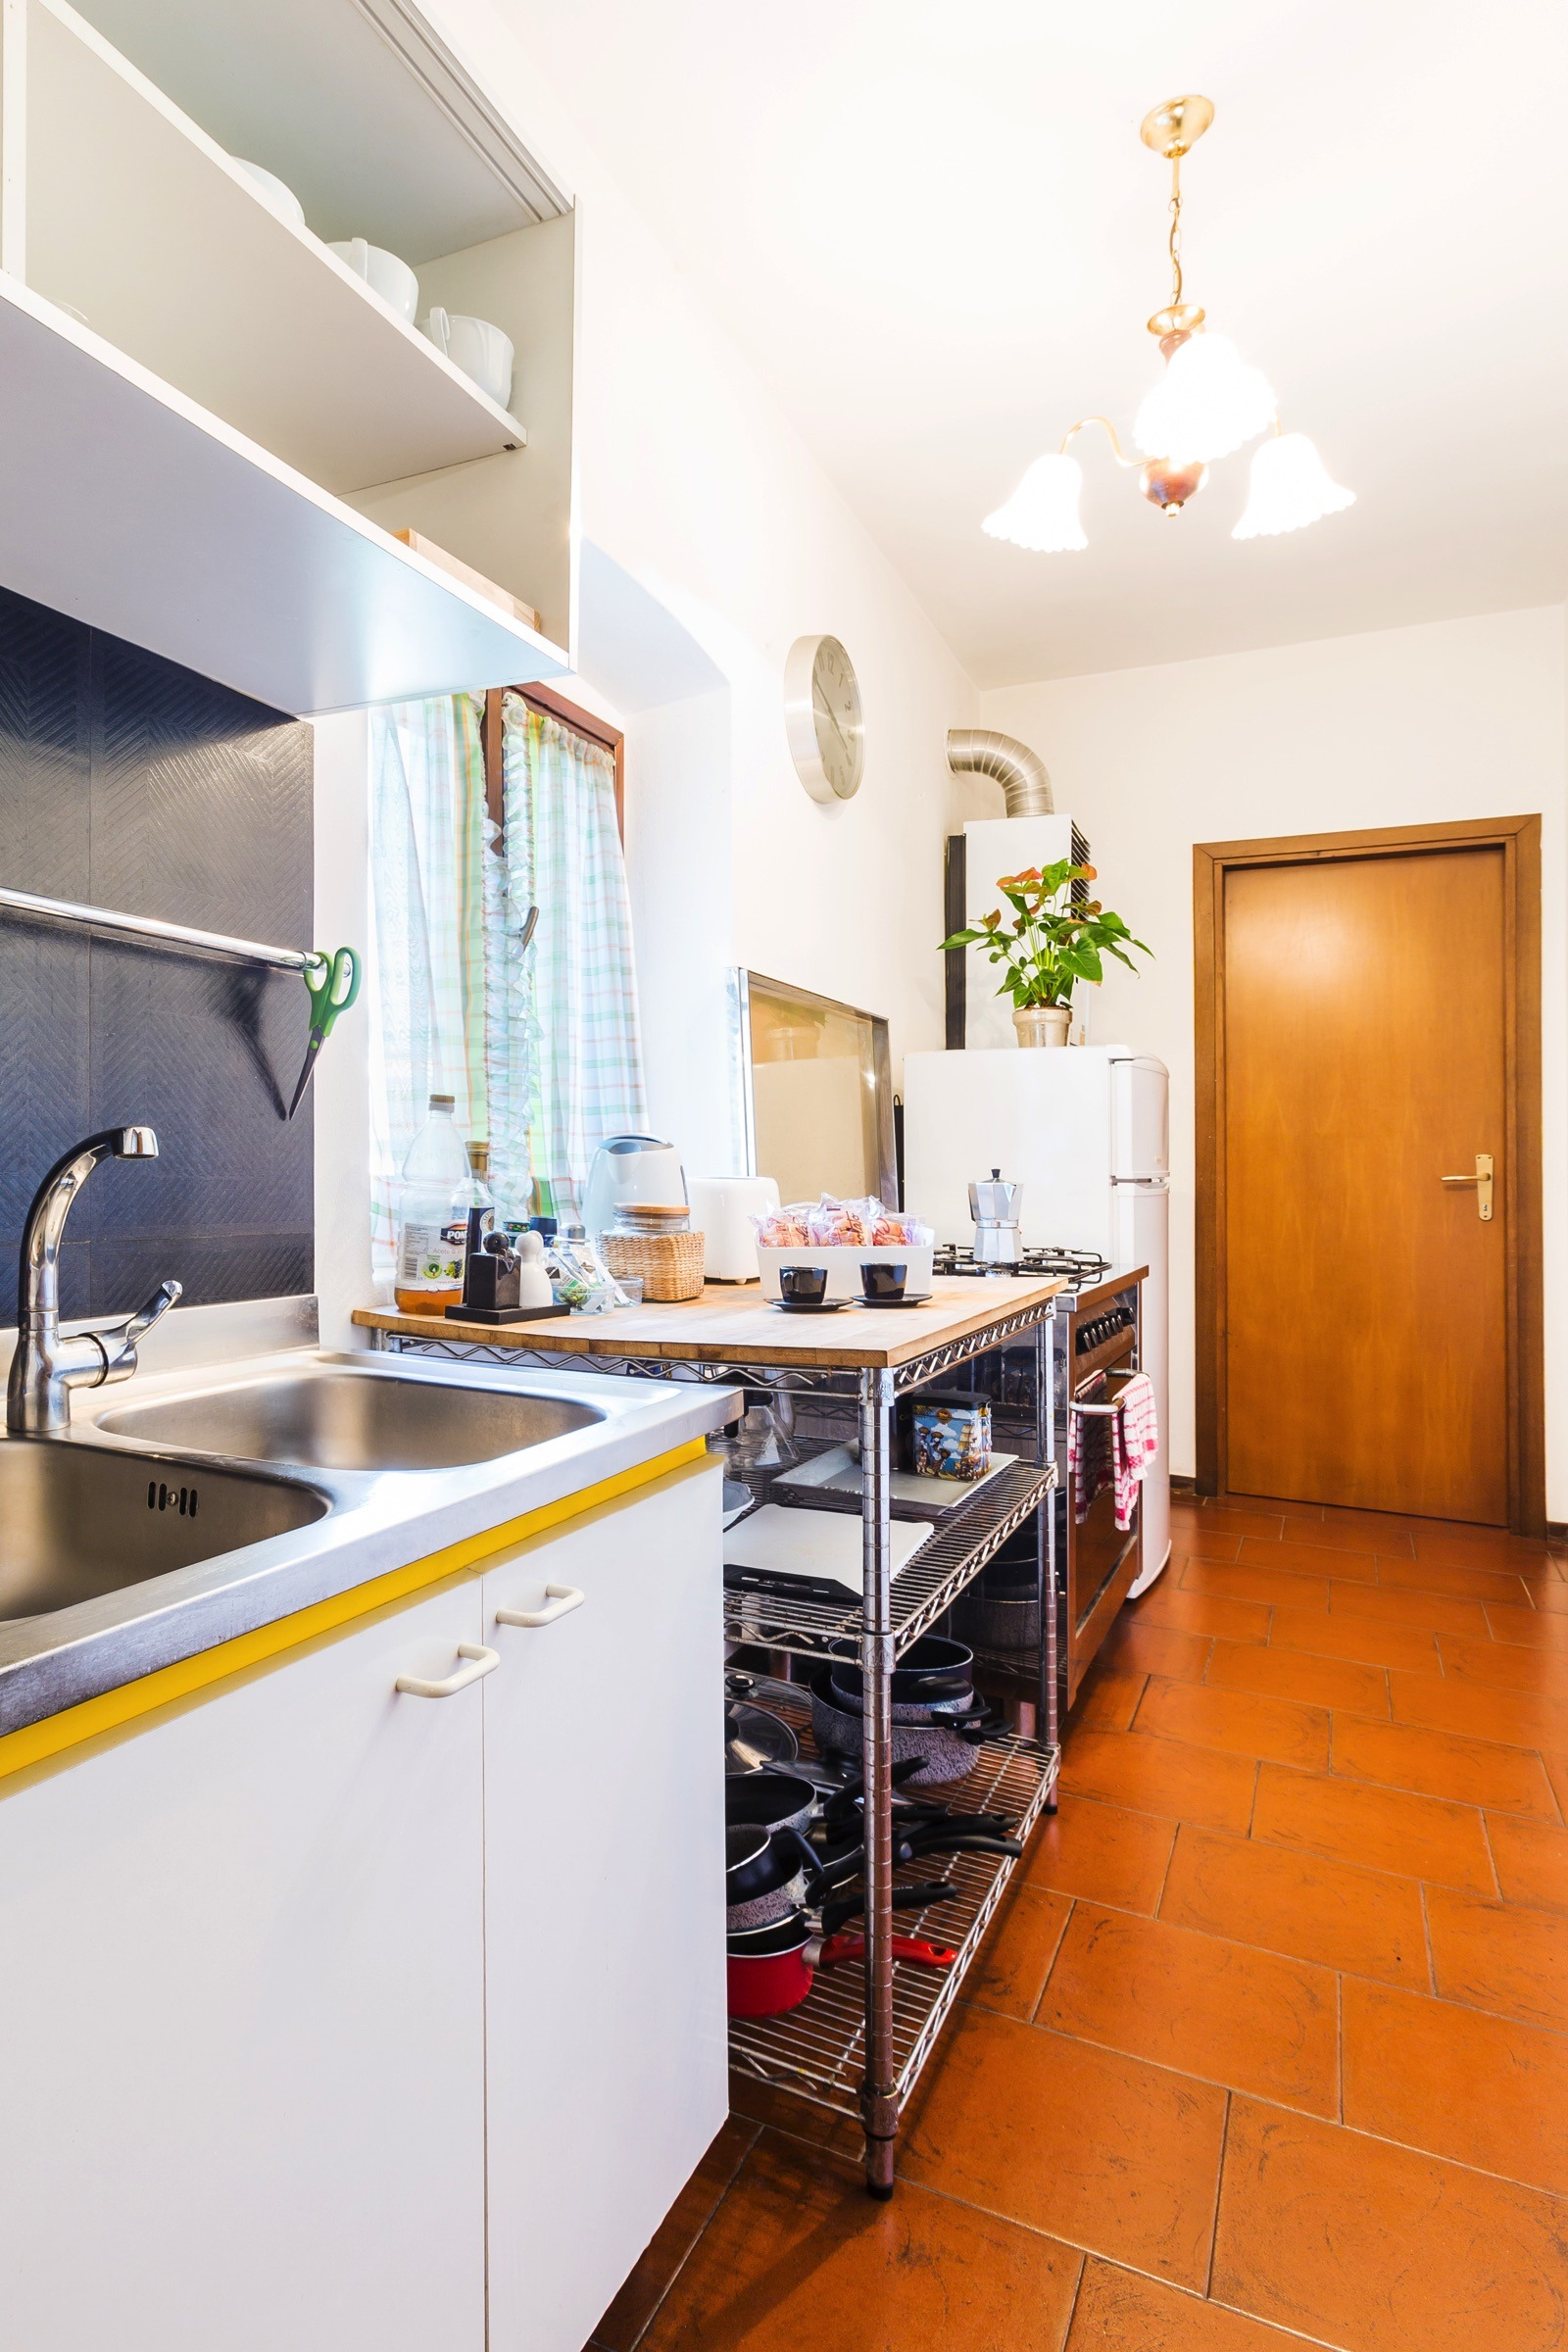 Appartamenti-012-Resized